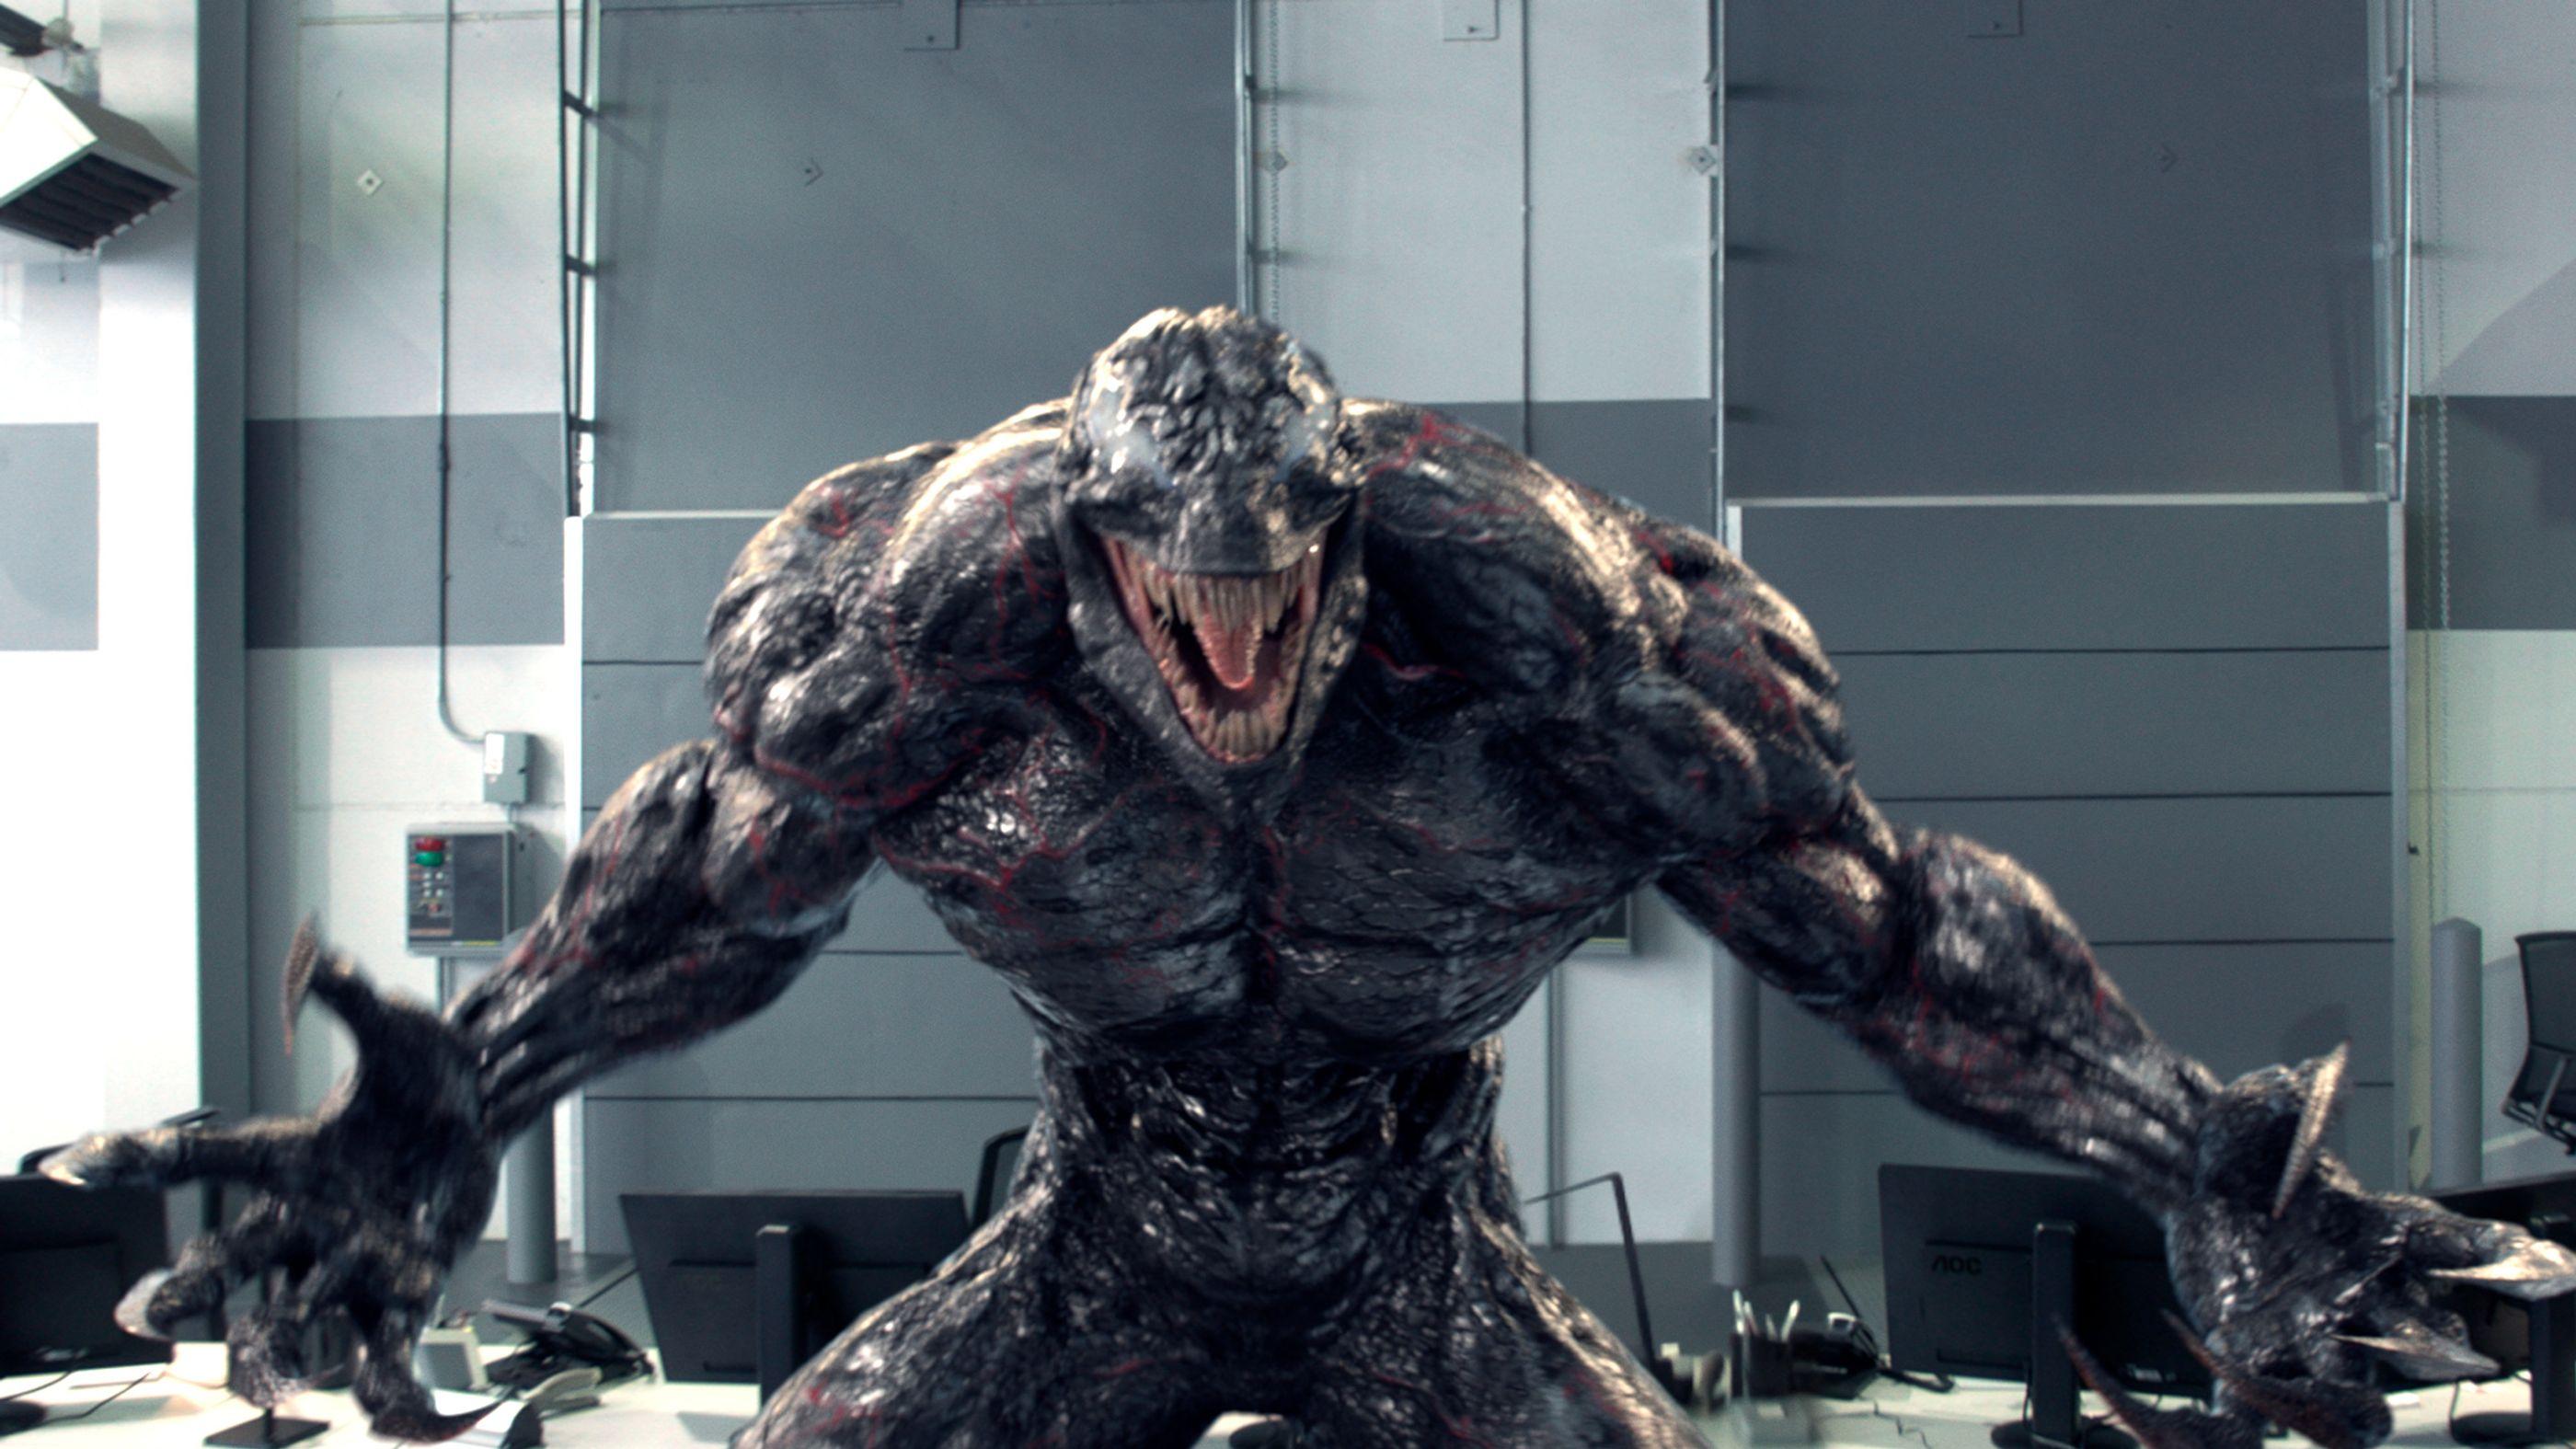 Venom Full Movie